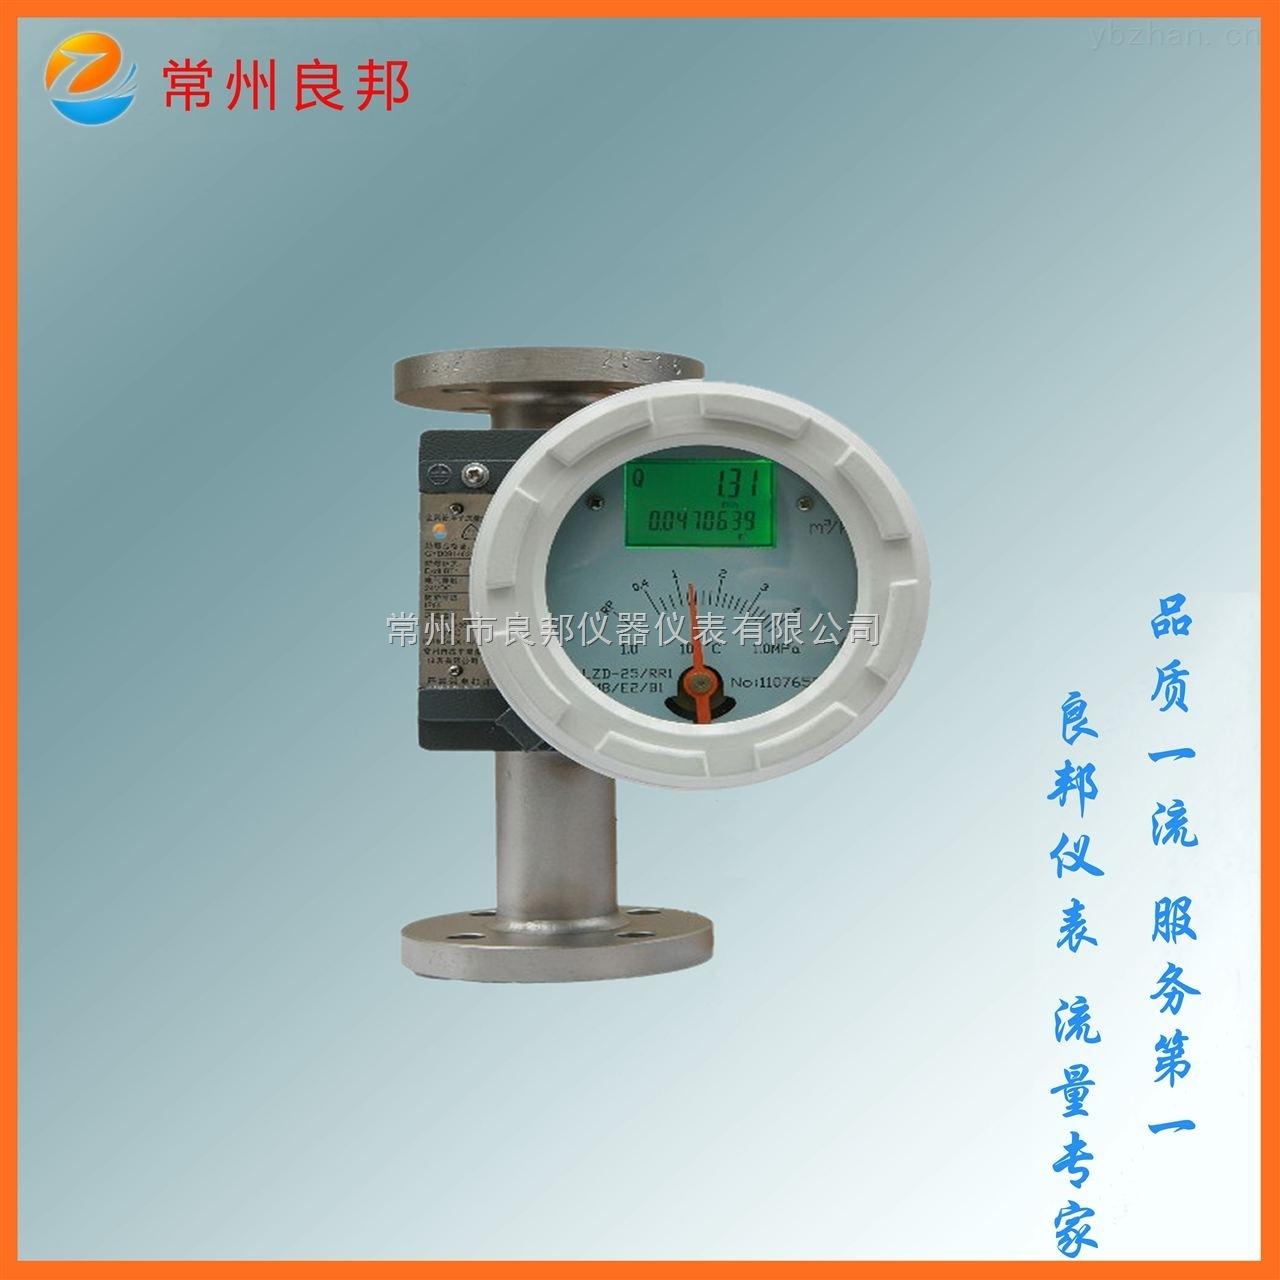 LZD-25-电远传金属管浮子流量计生产/ 液体流量测量准确 厂家包邮质量好价格实惠